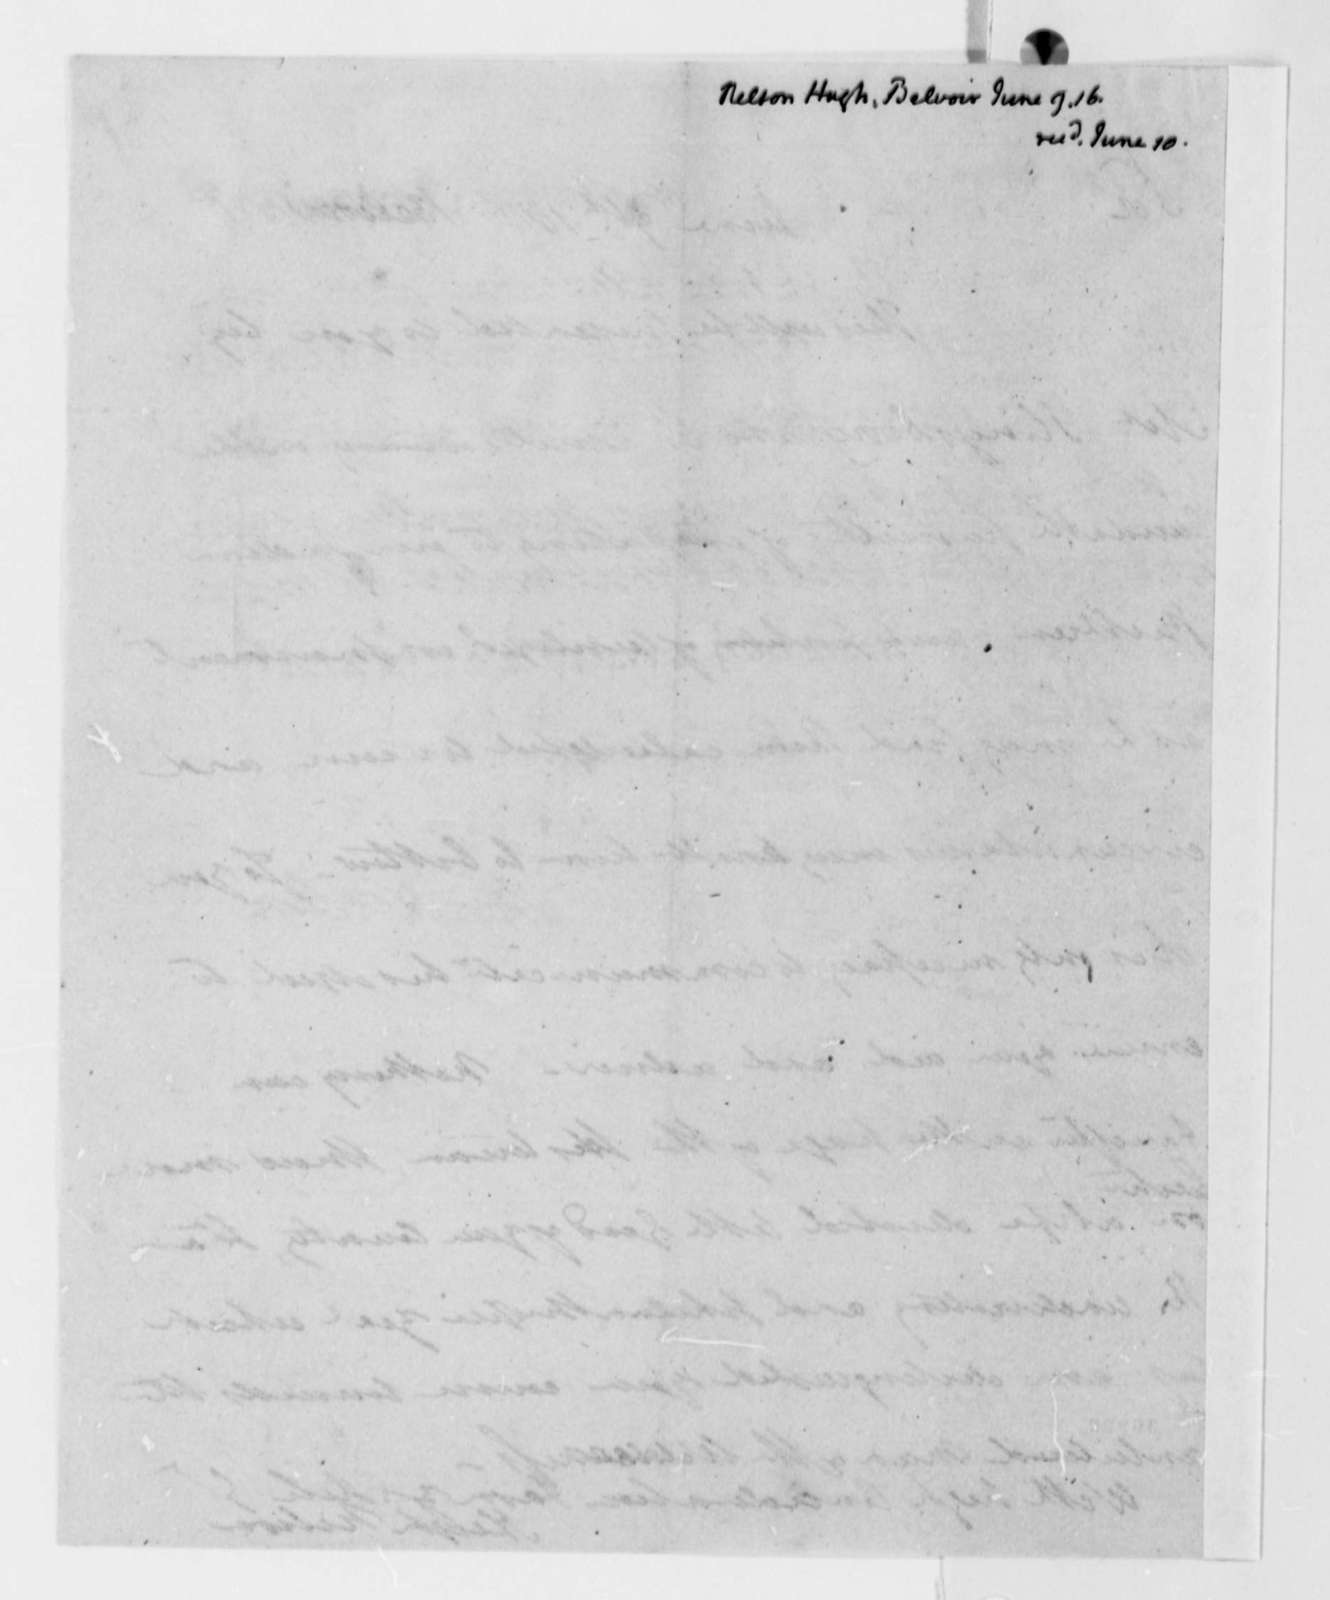 Hugh Nelson to Thomas Jefferson, June 9, 1816